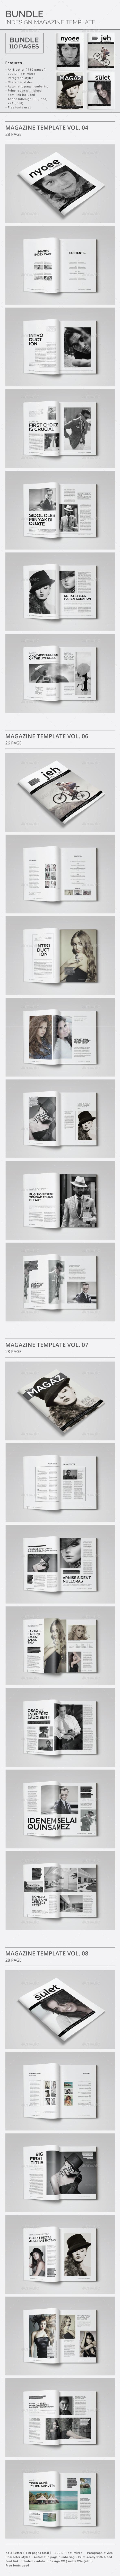 Indesign Magazine Bundle - Magazines Print Templates